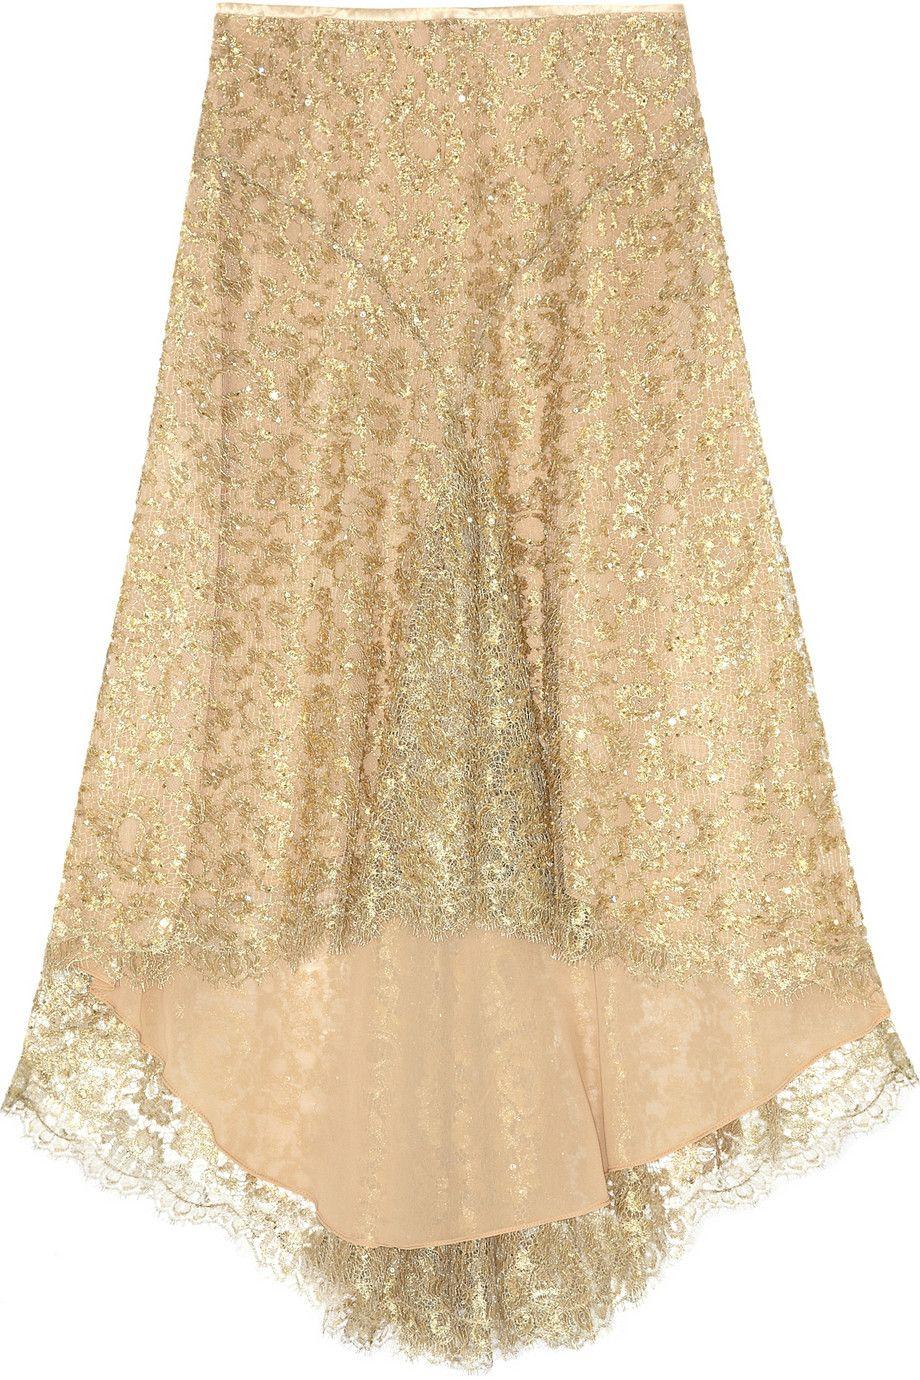 Michael kors bead and sequinembellished metalliclace skirt my